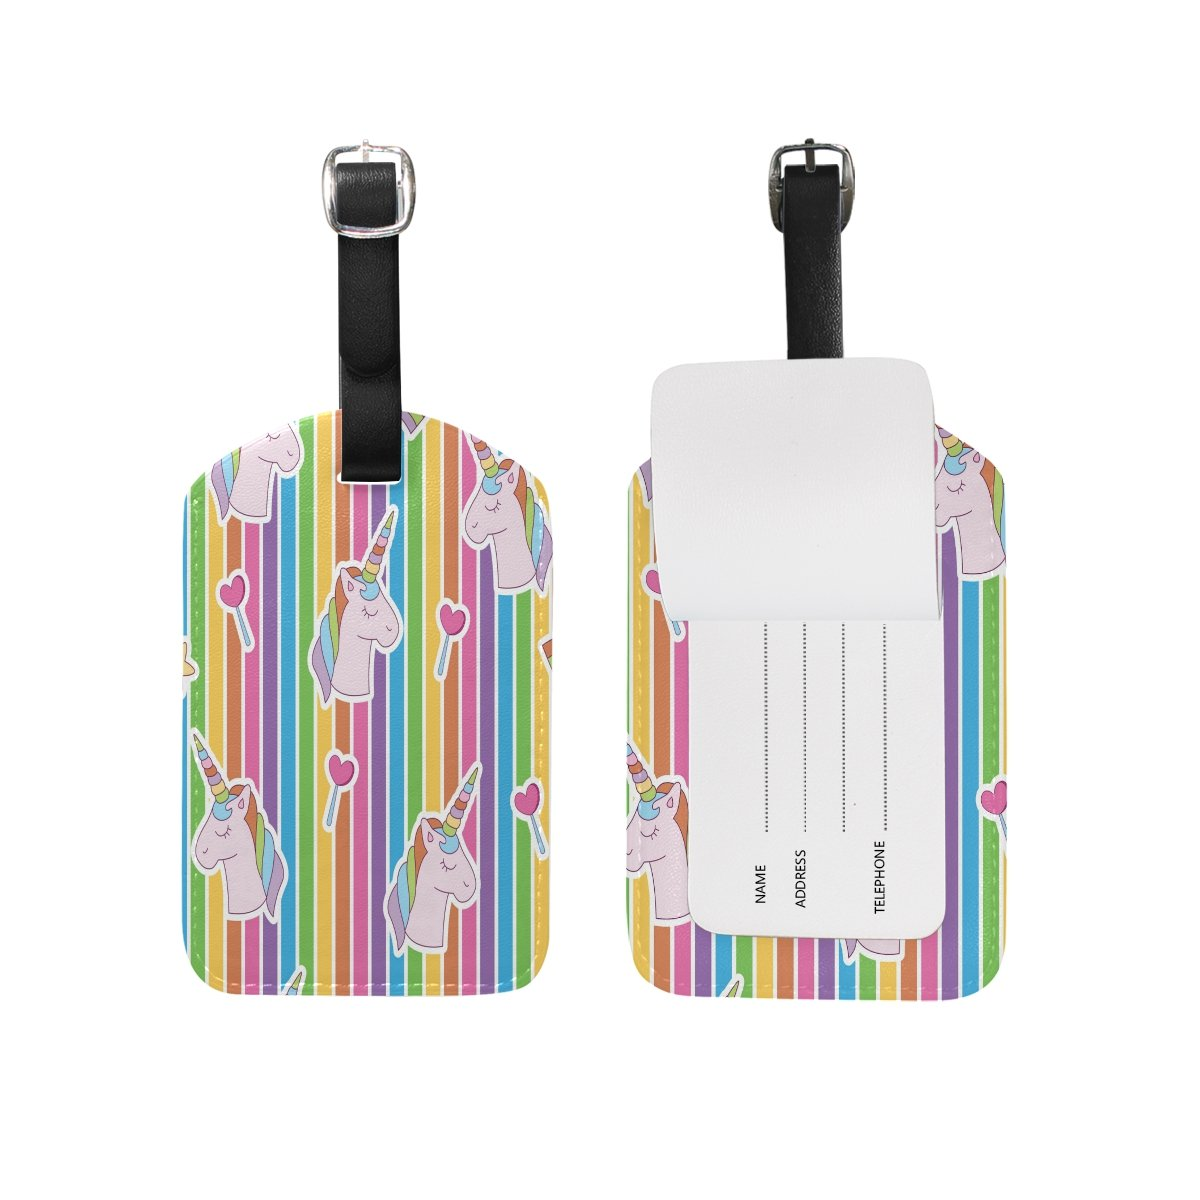 1Pcs Saobao Travel Luggage Tag Vibrant Edgy Unicorn Head Rainbow PU Leather Baggage Suitcase Travel ID Bag Tag